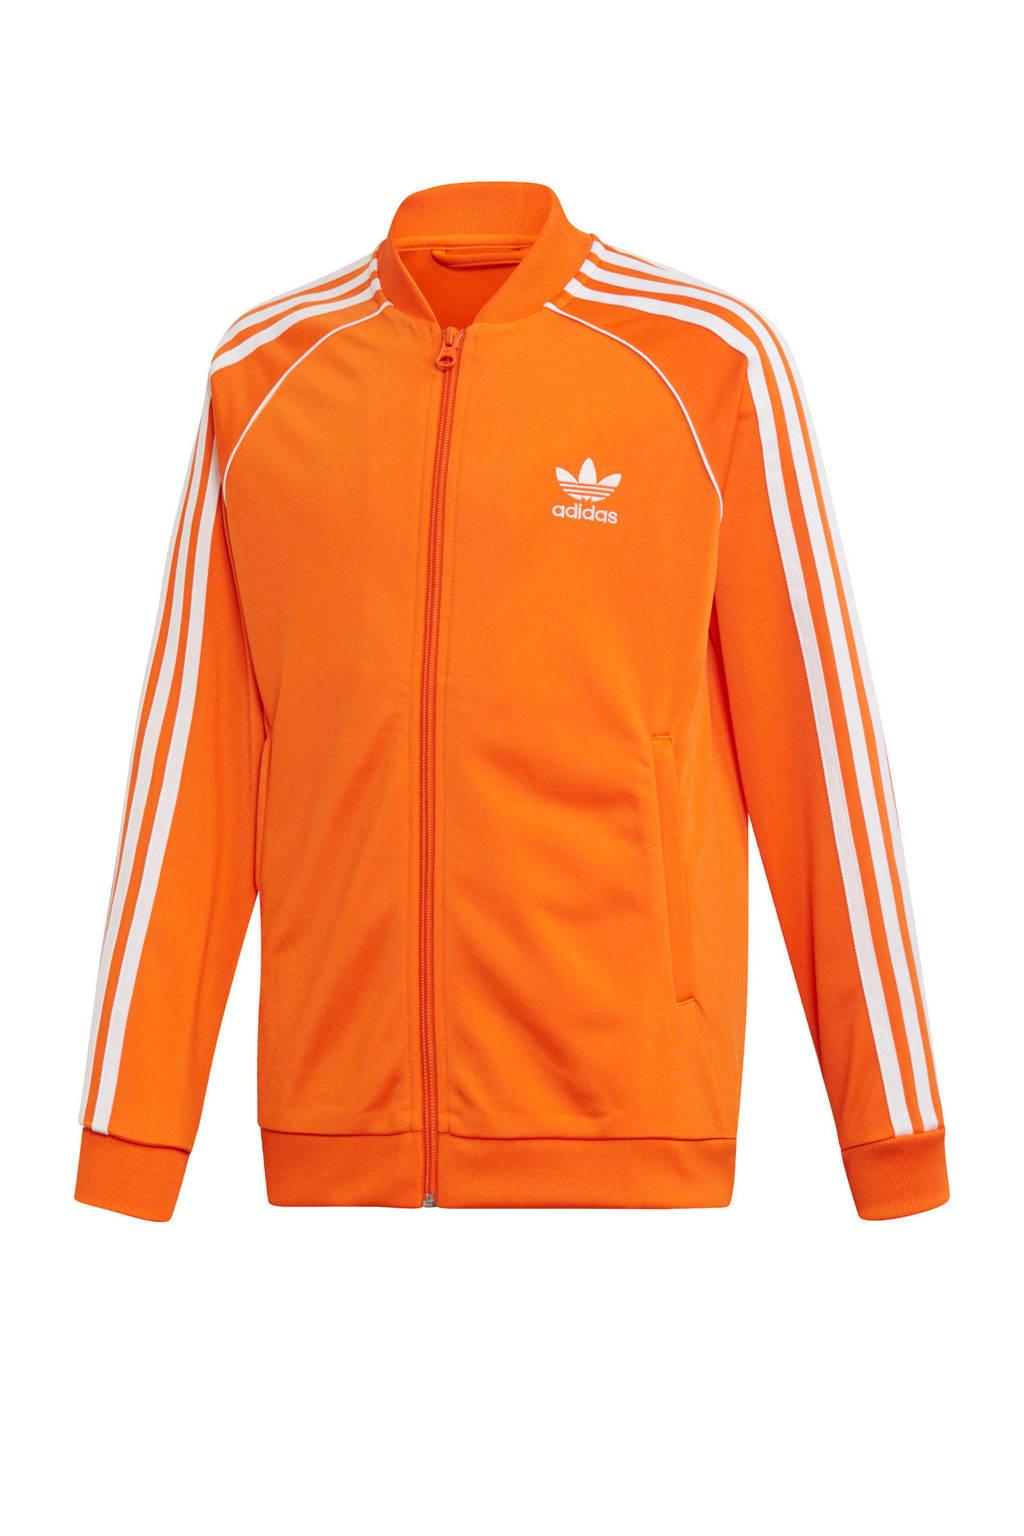 adidas originals   Adicolor vest oranje, Oranje